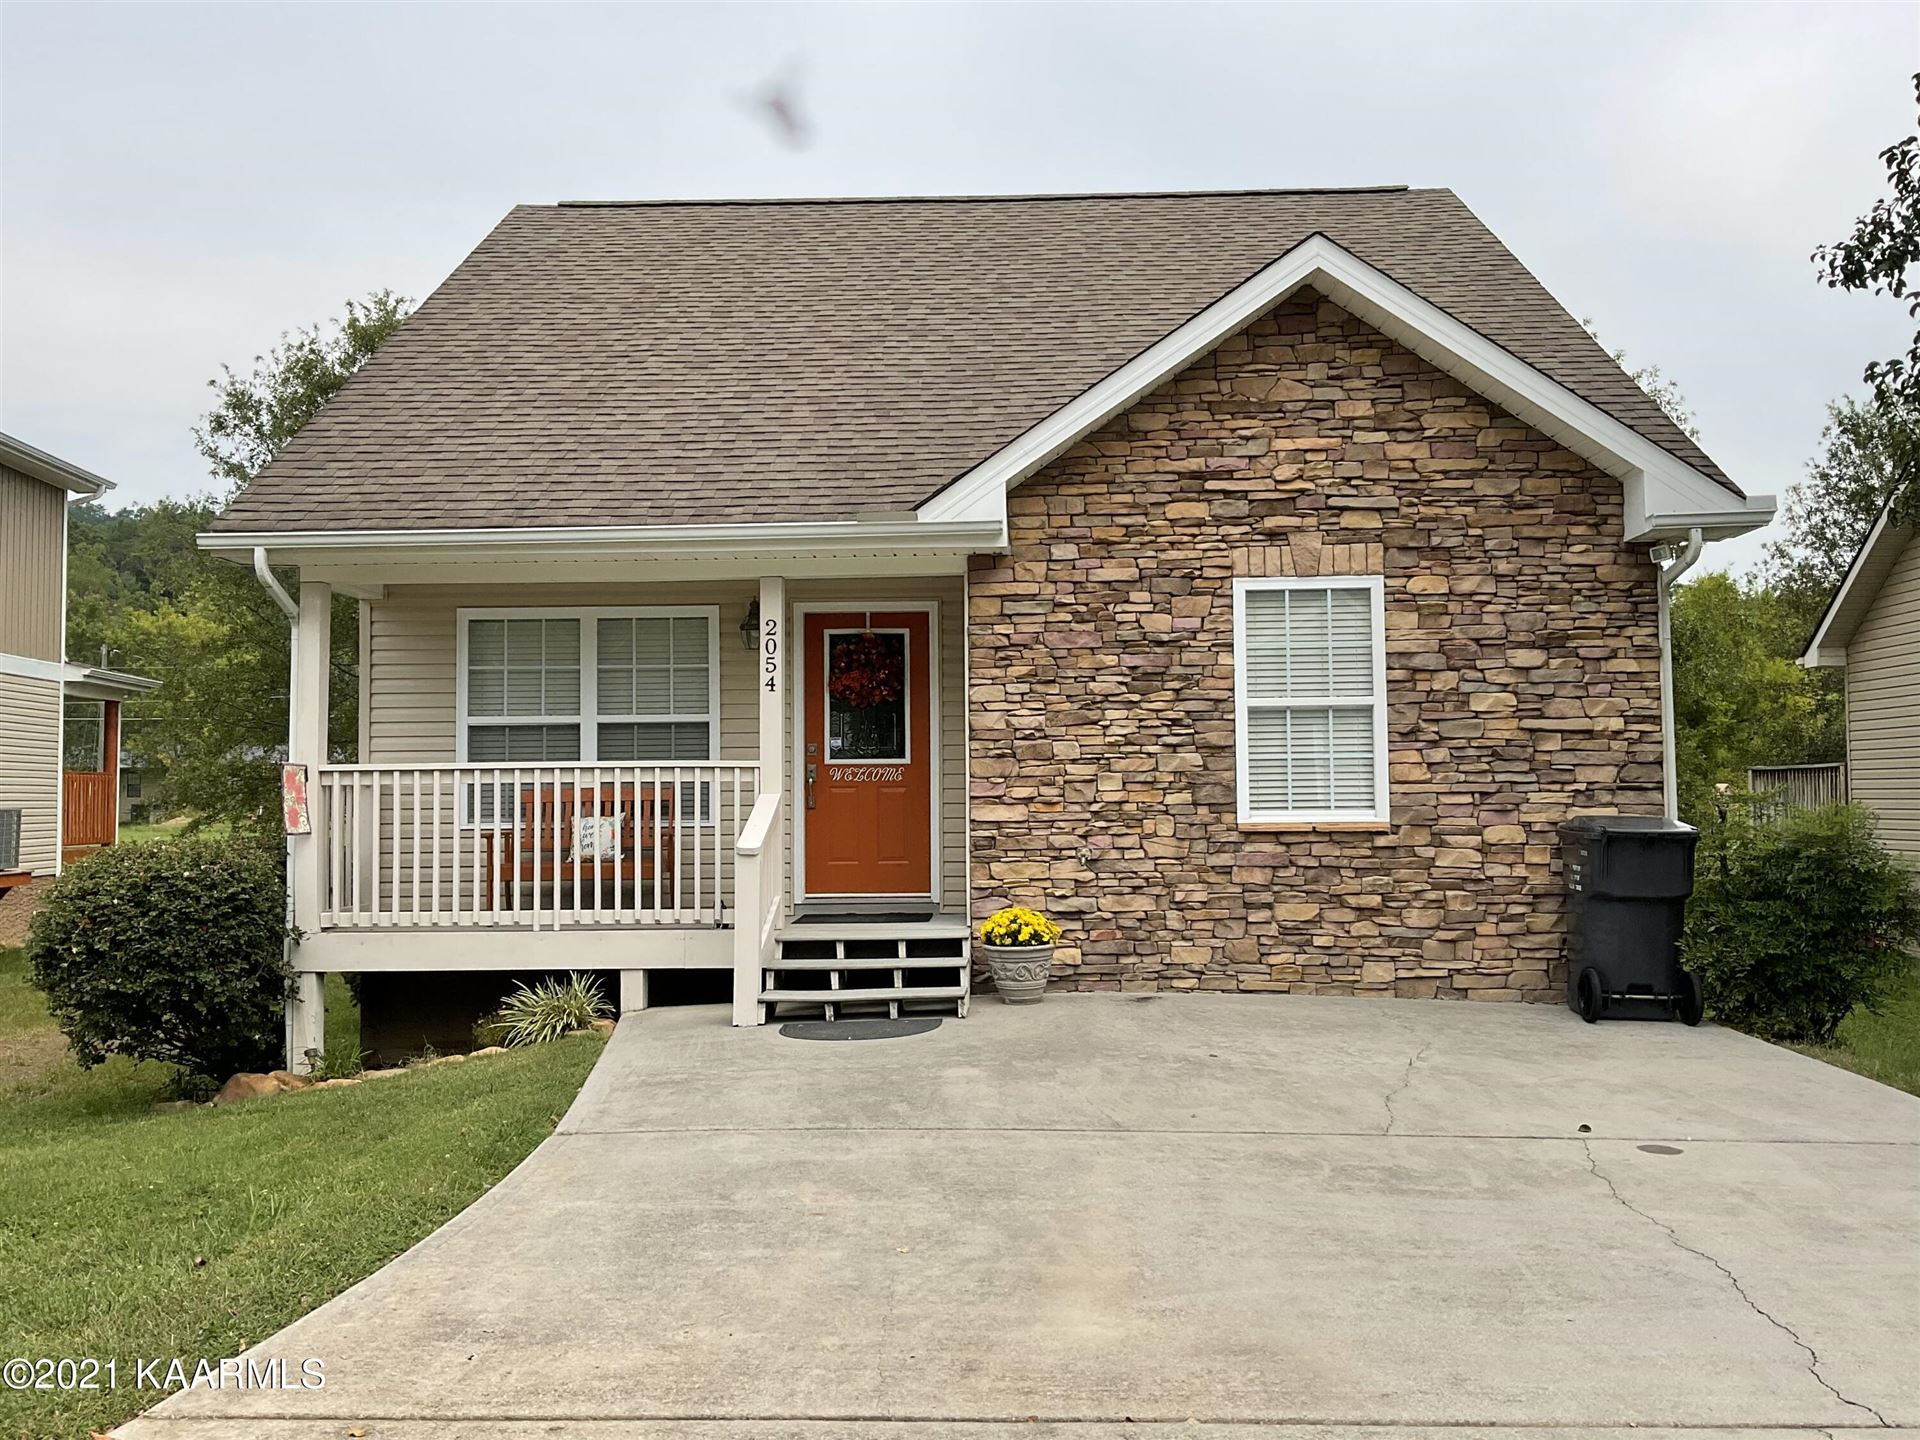 Photo of 2054 Slippery Rock Circle, Sevierville, TN 37862 (MLS # 1167562)